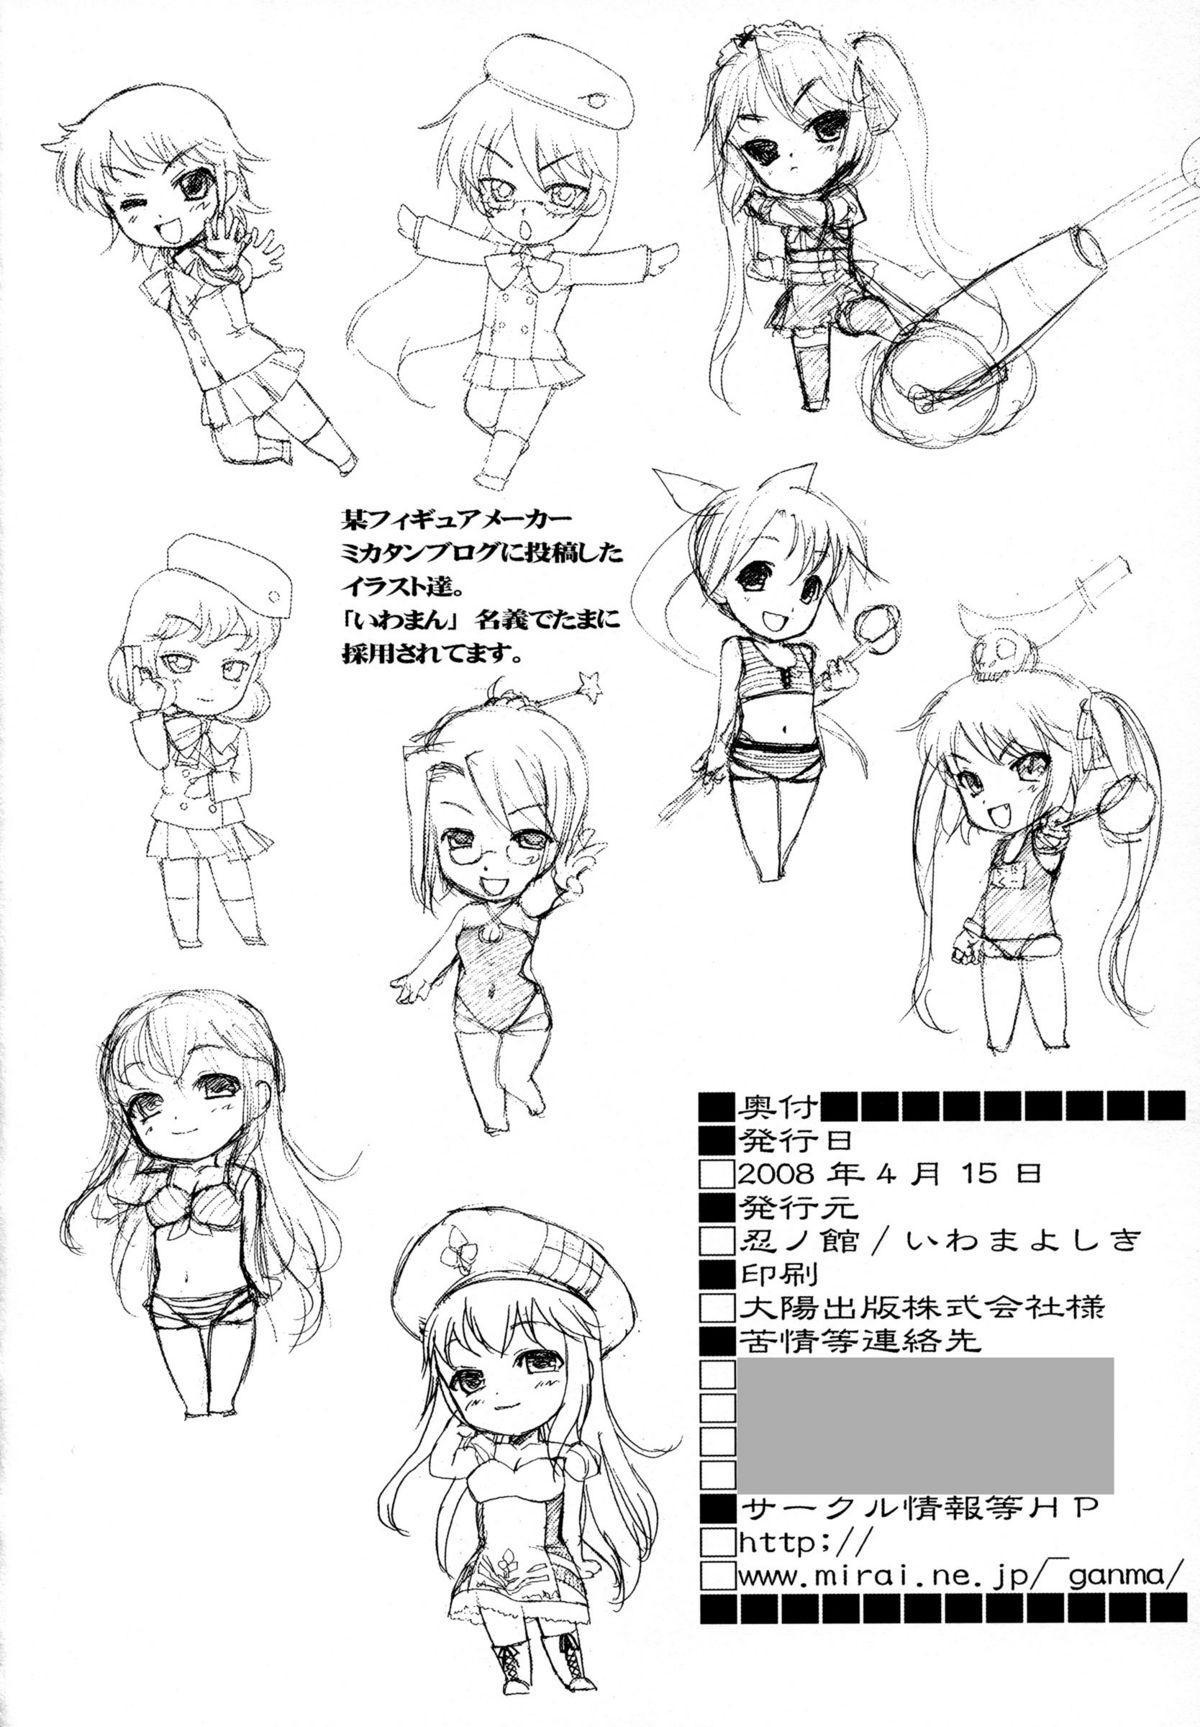 JEWELBOX DECADENT-GRAY Kyuukyousha no Toilet Kagami Tsukasa no Ecchi na Hon 48